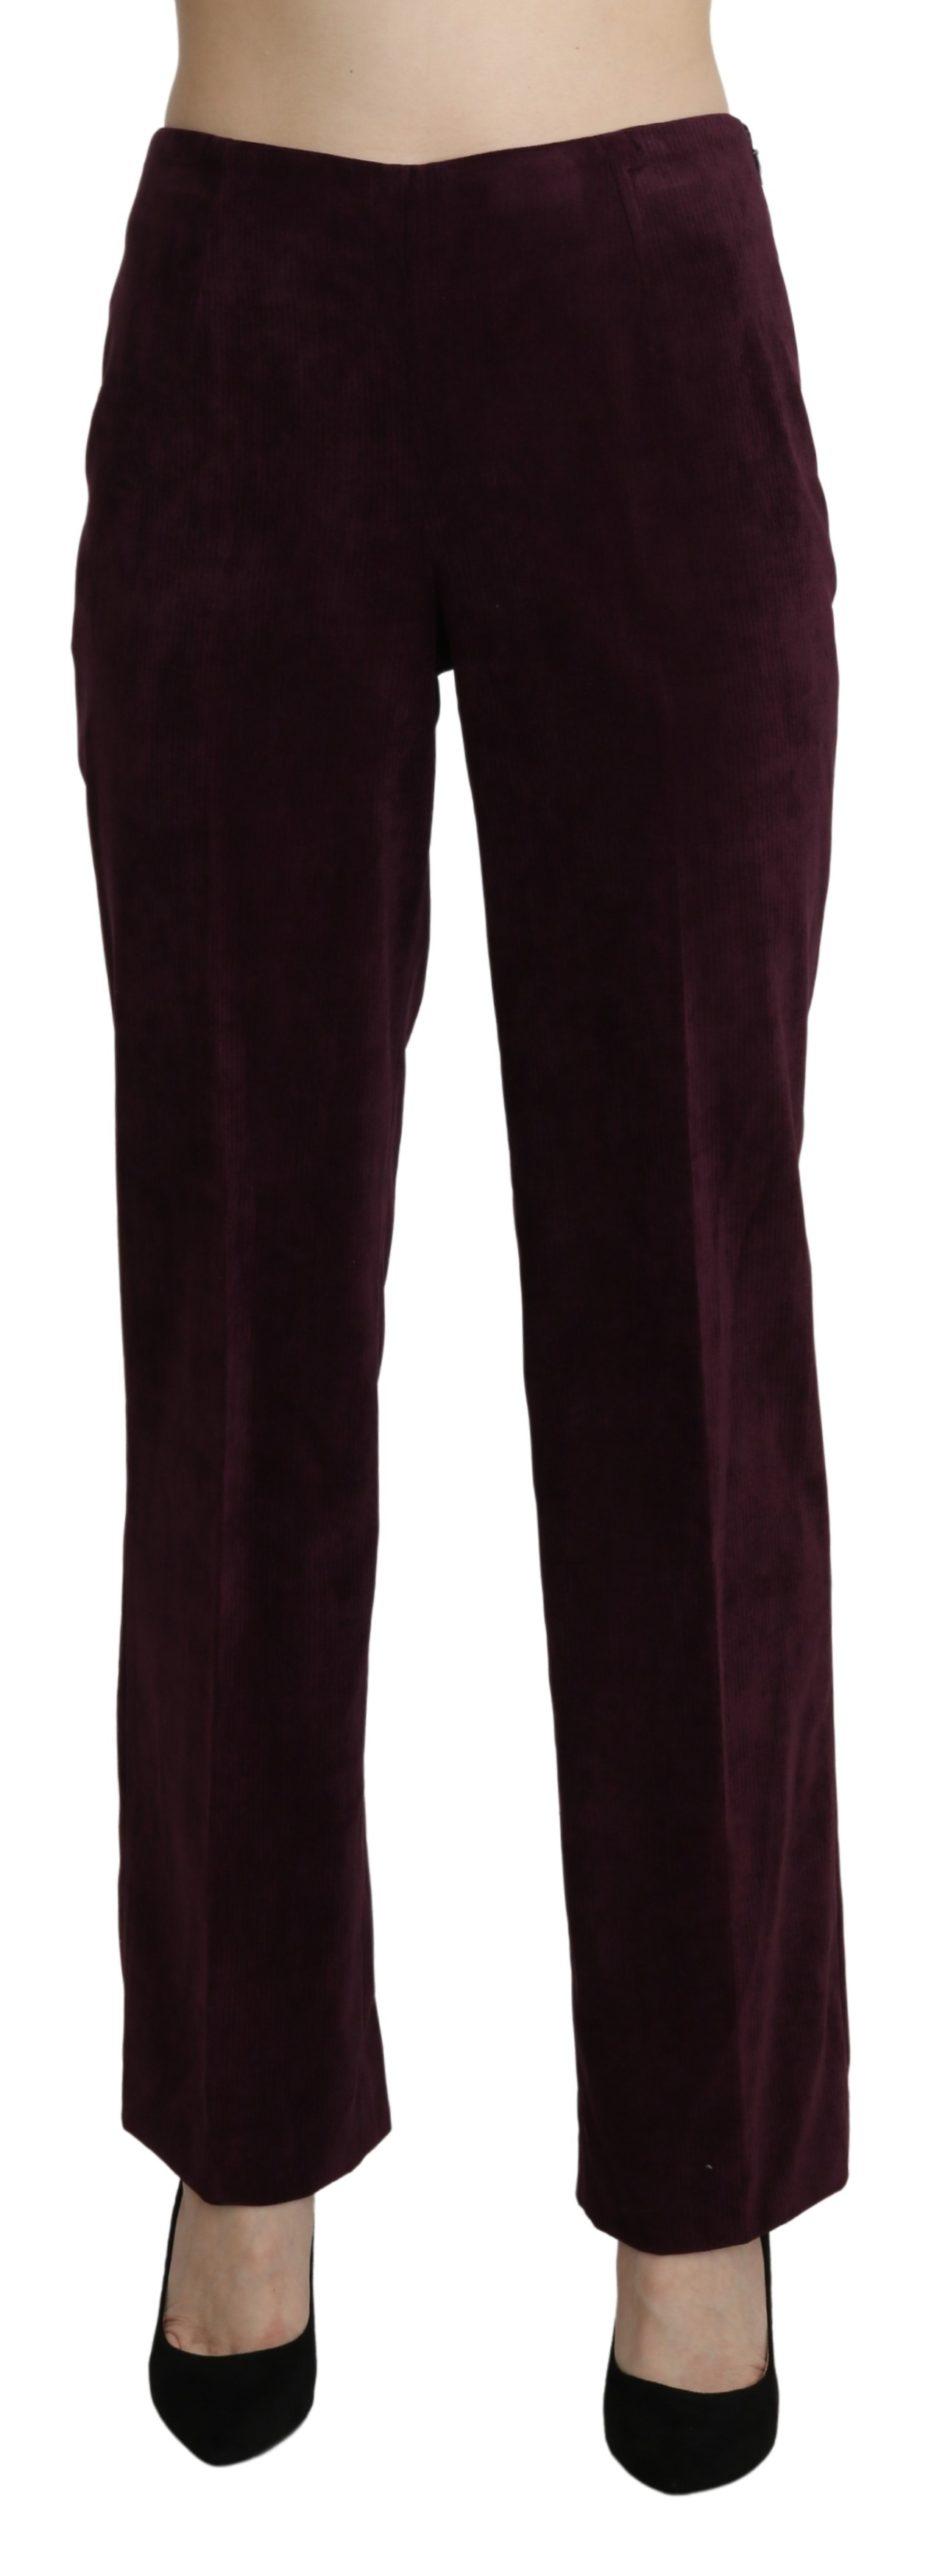 BENCIVENGA Women's Suede High Waist Straight Trousers Purple PAN71365-48 - IT48|XXL